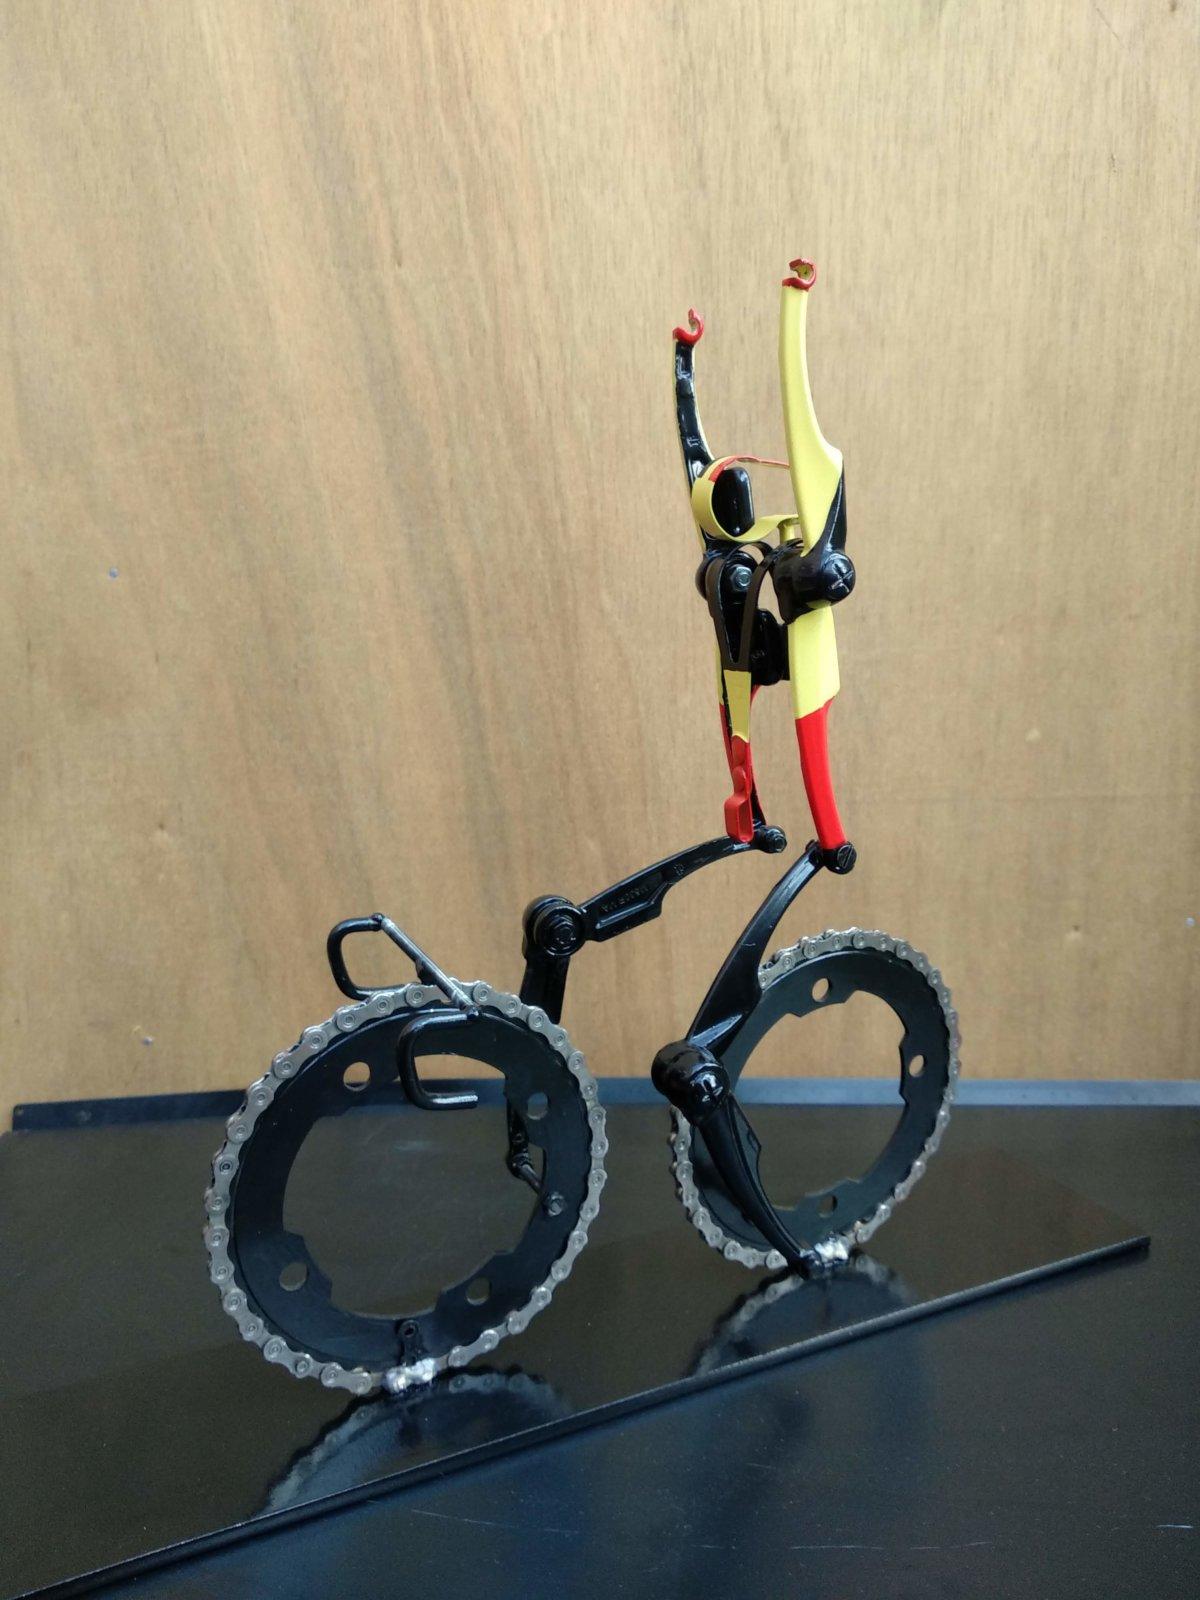 Victory! In The Belgium Tricolore Cyclingart By Hubert Van Soest